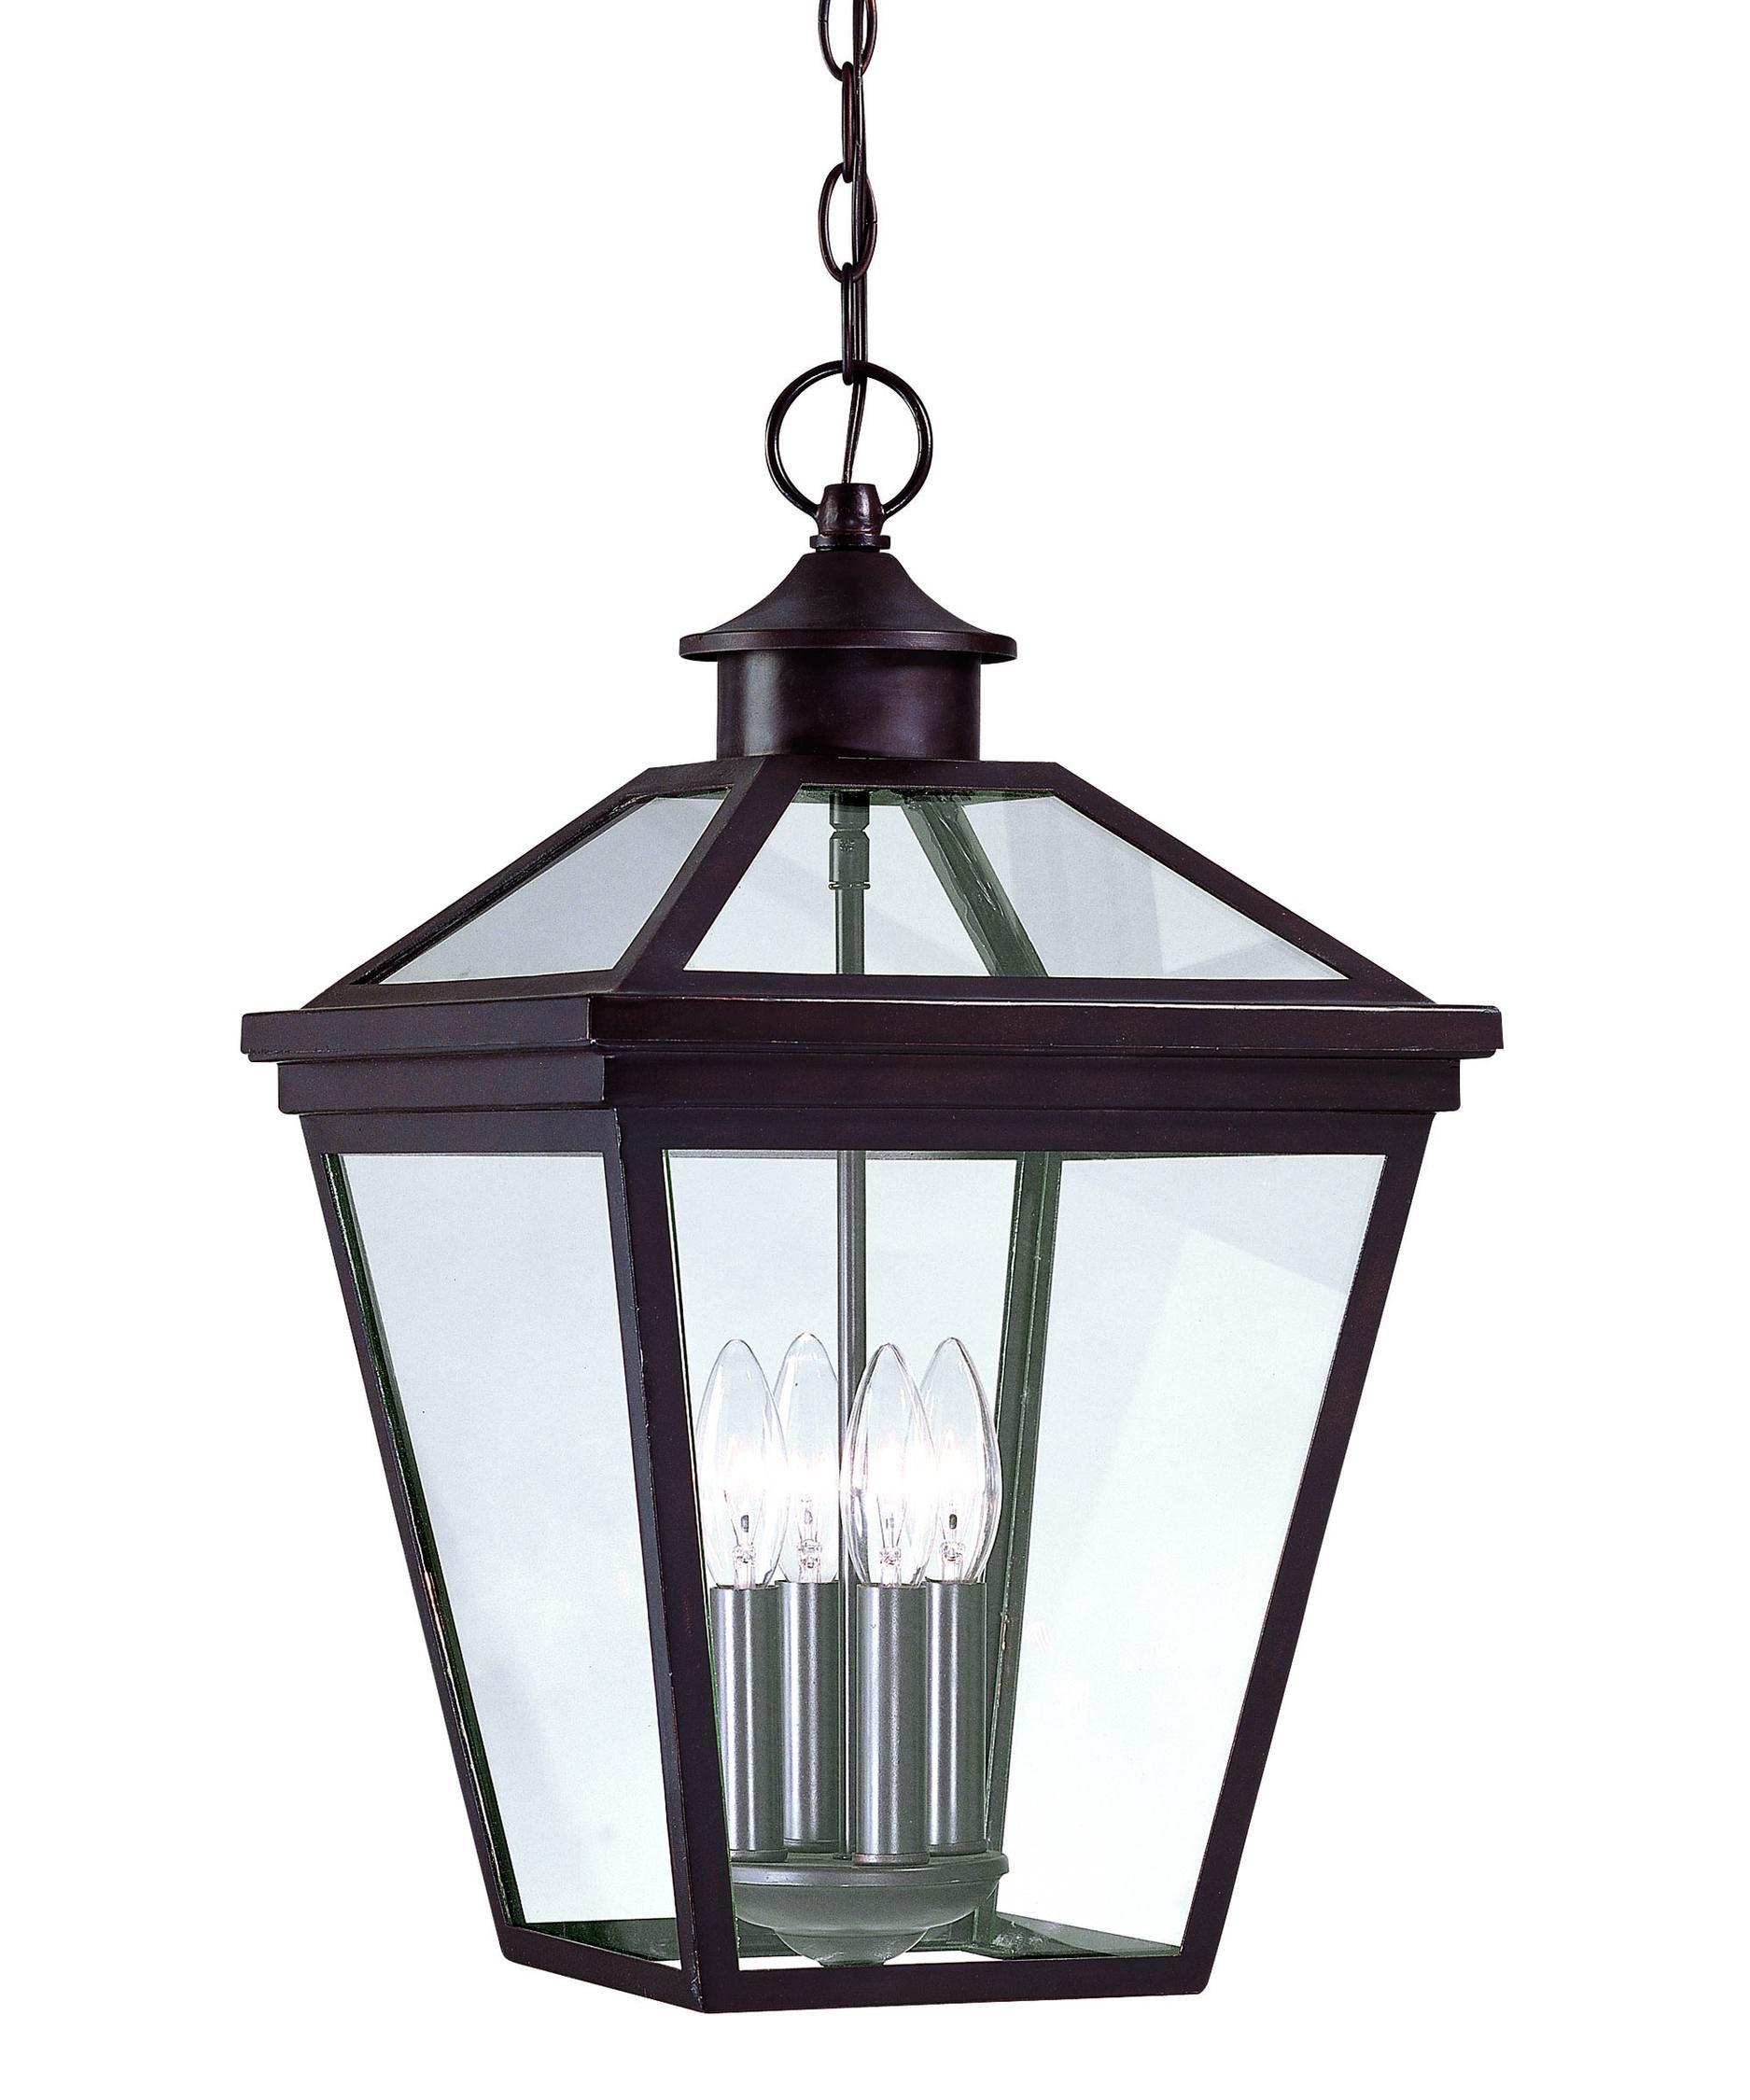 Beautiful Savoy House Ellijay 4 Light Outdoor Hanging Lantern   Capitol Lighting  1 800lighting.com